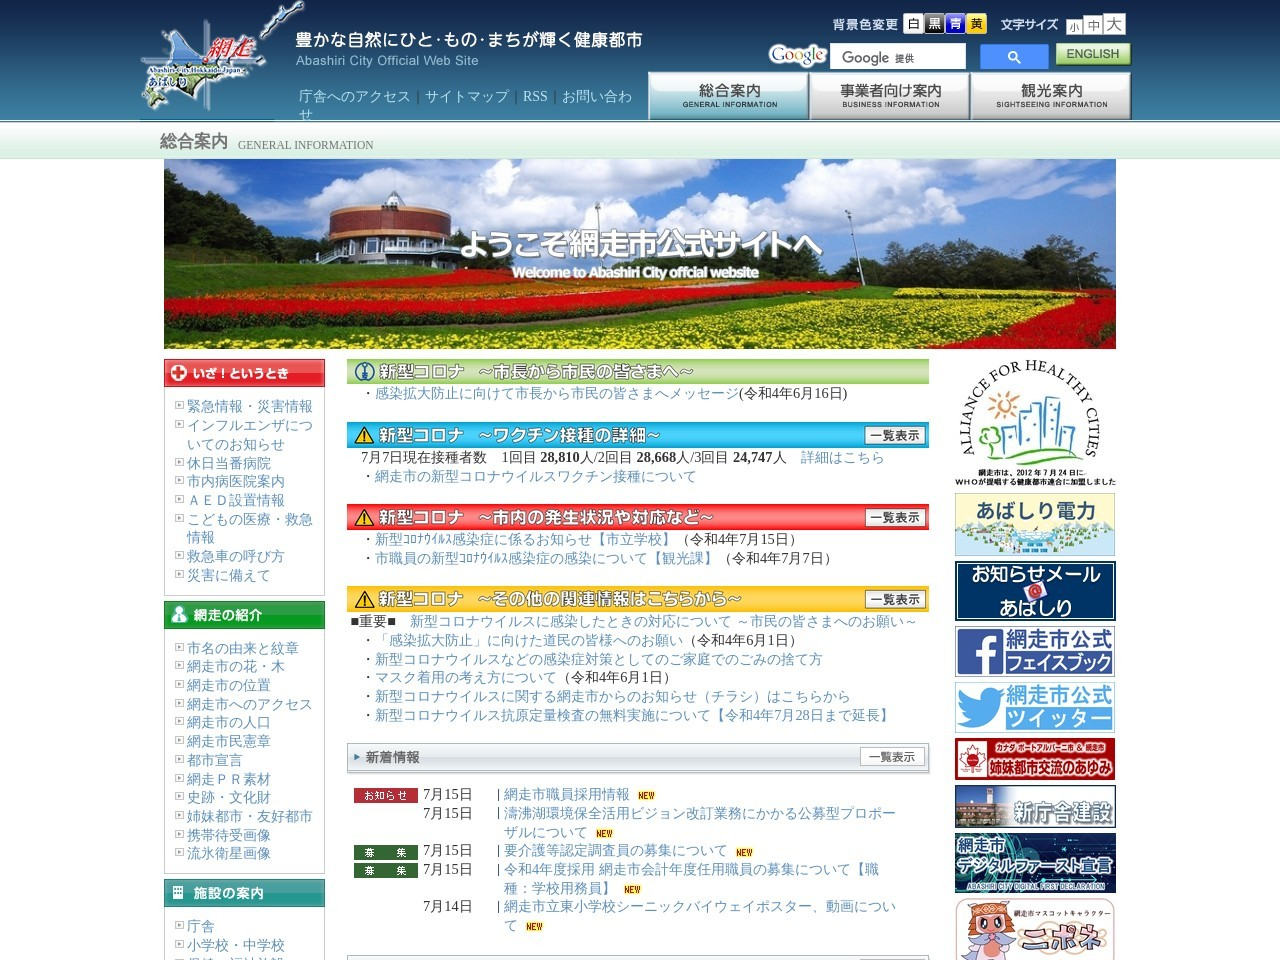 http://www.city.abashiri.hokkaido.jp/004event/hama-okaasan.html